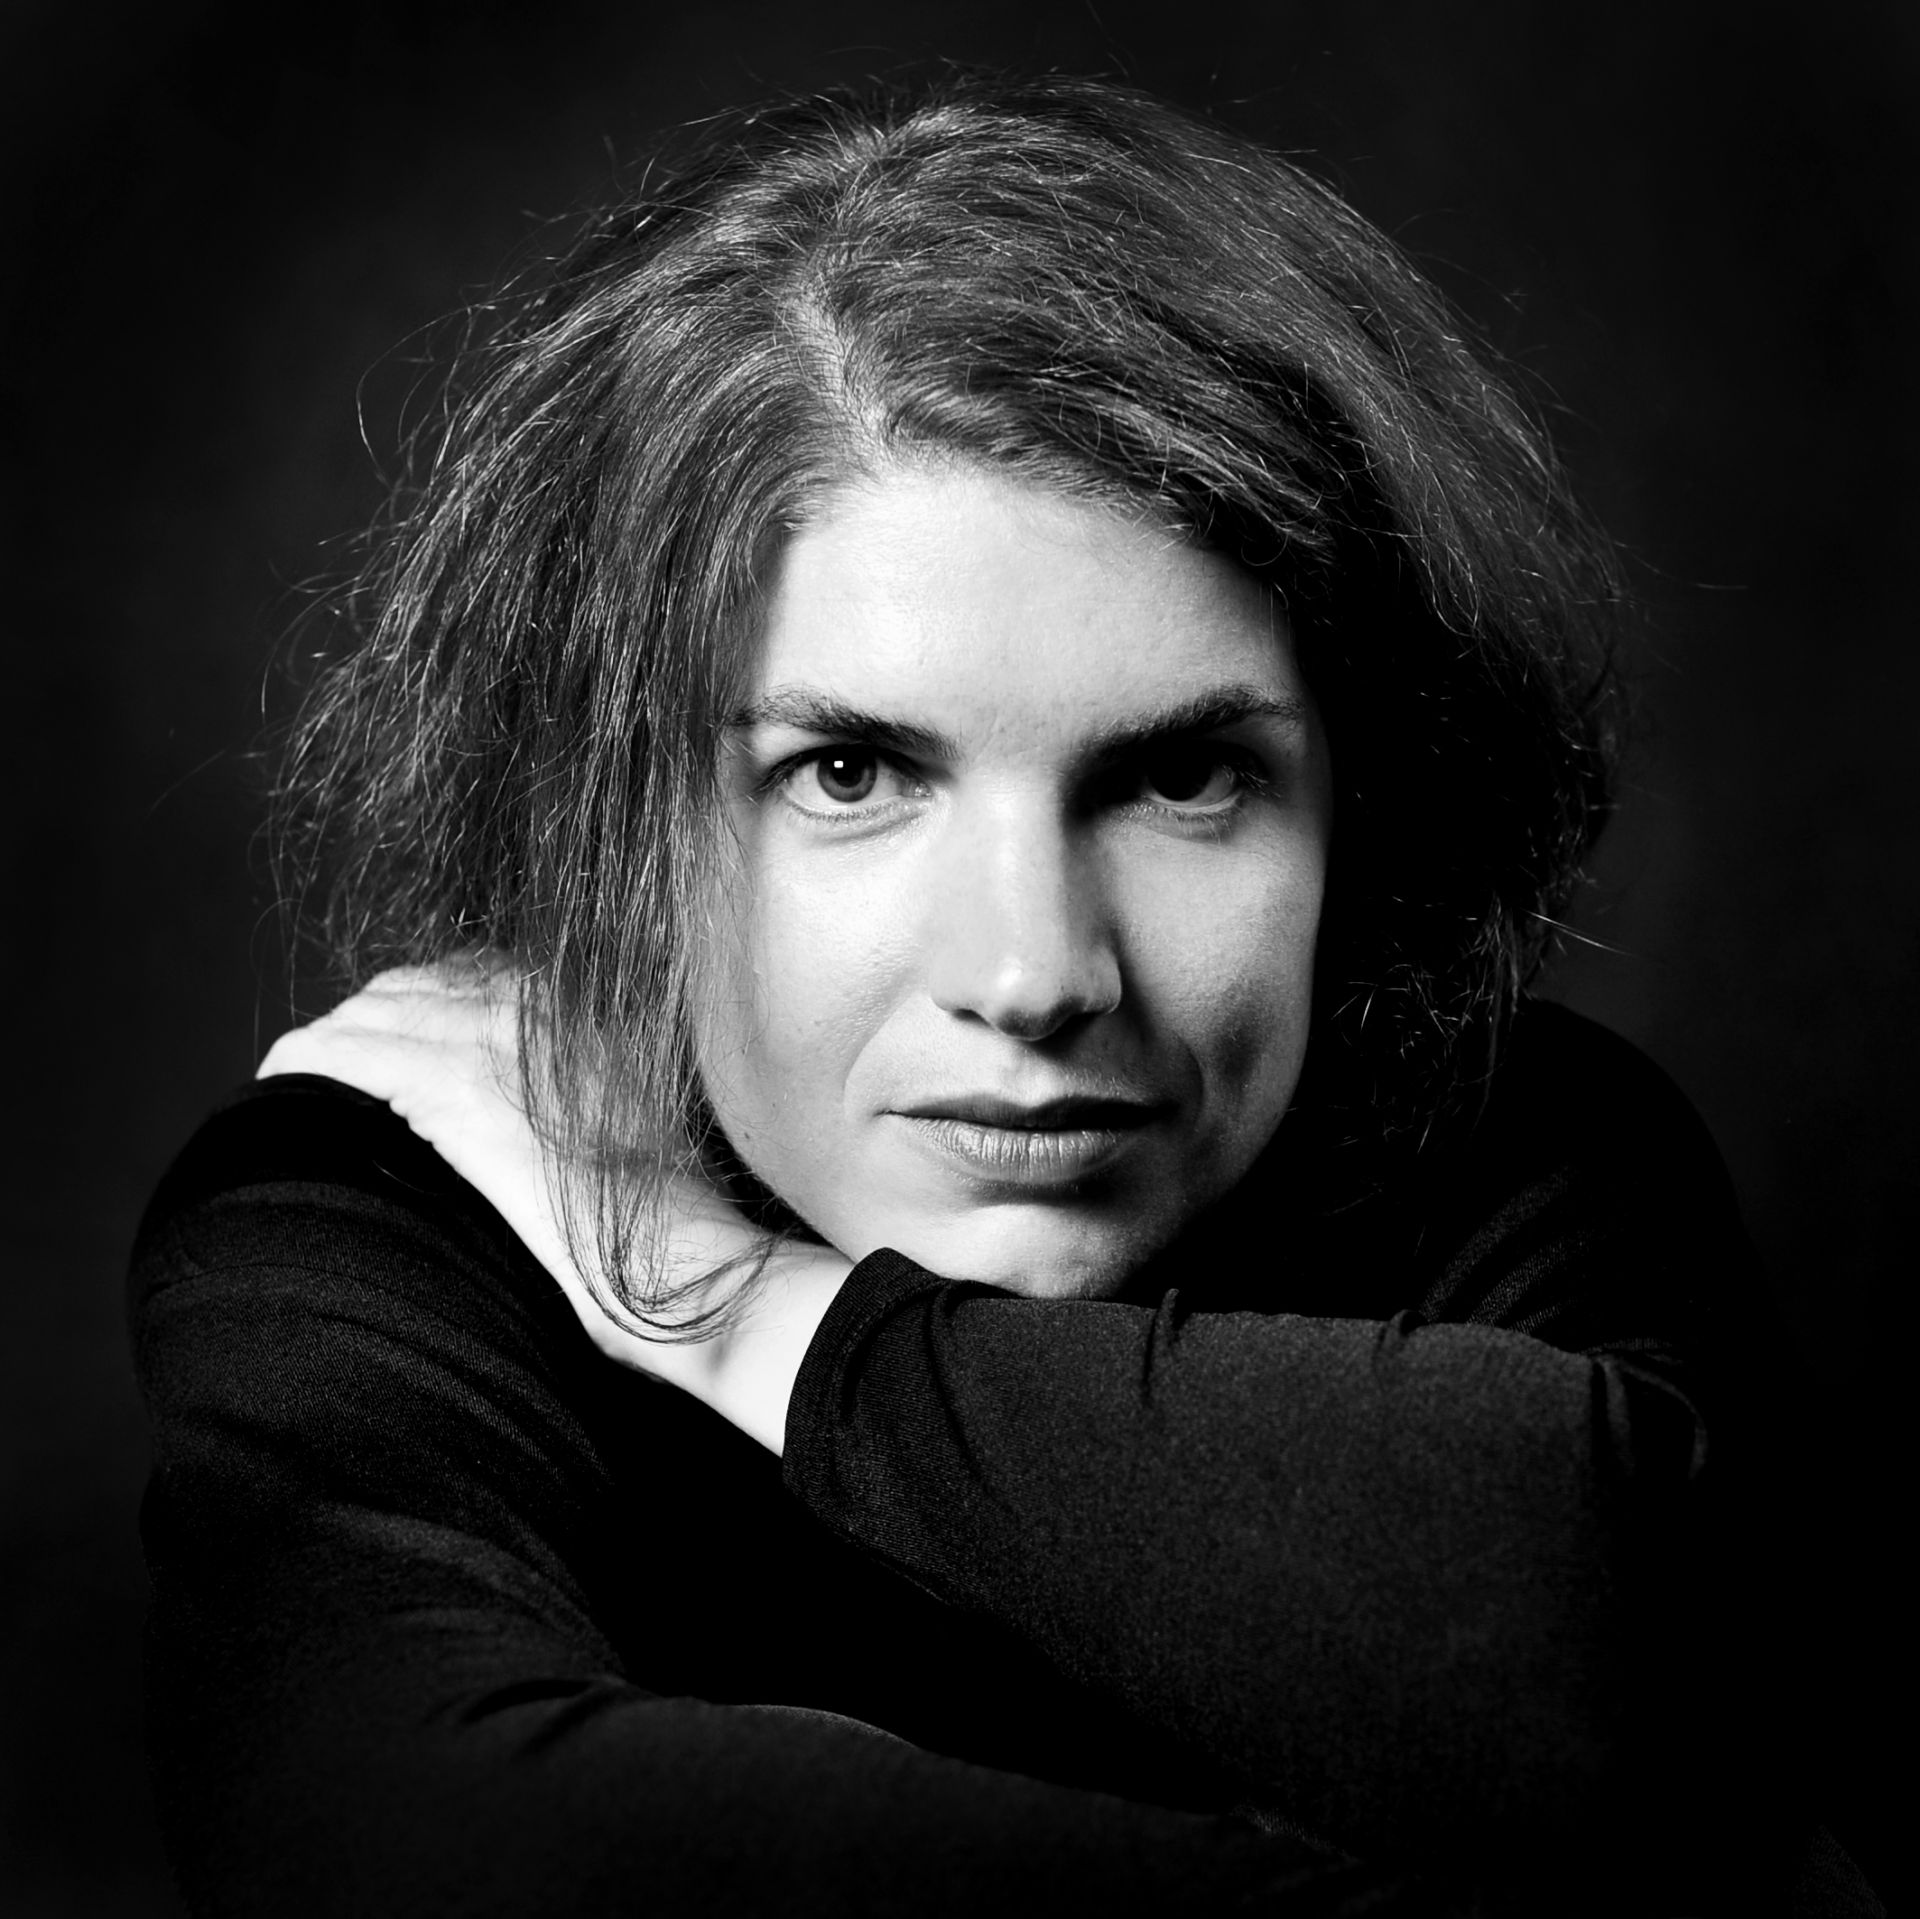 Magda Bożyk